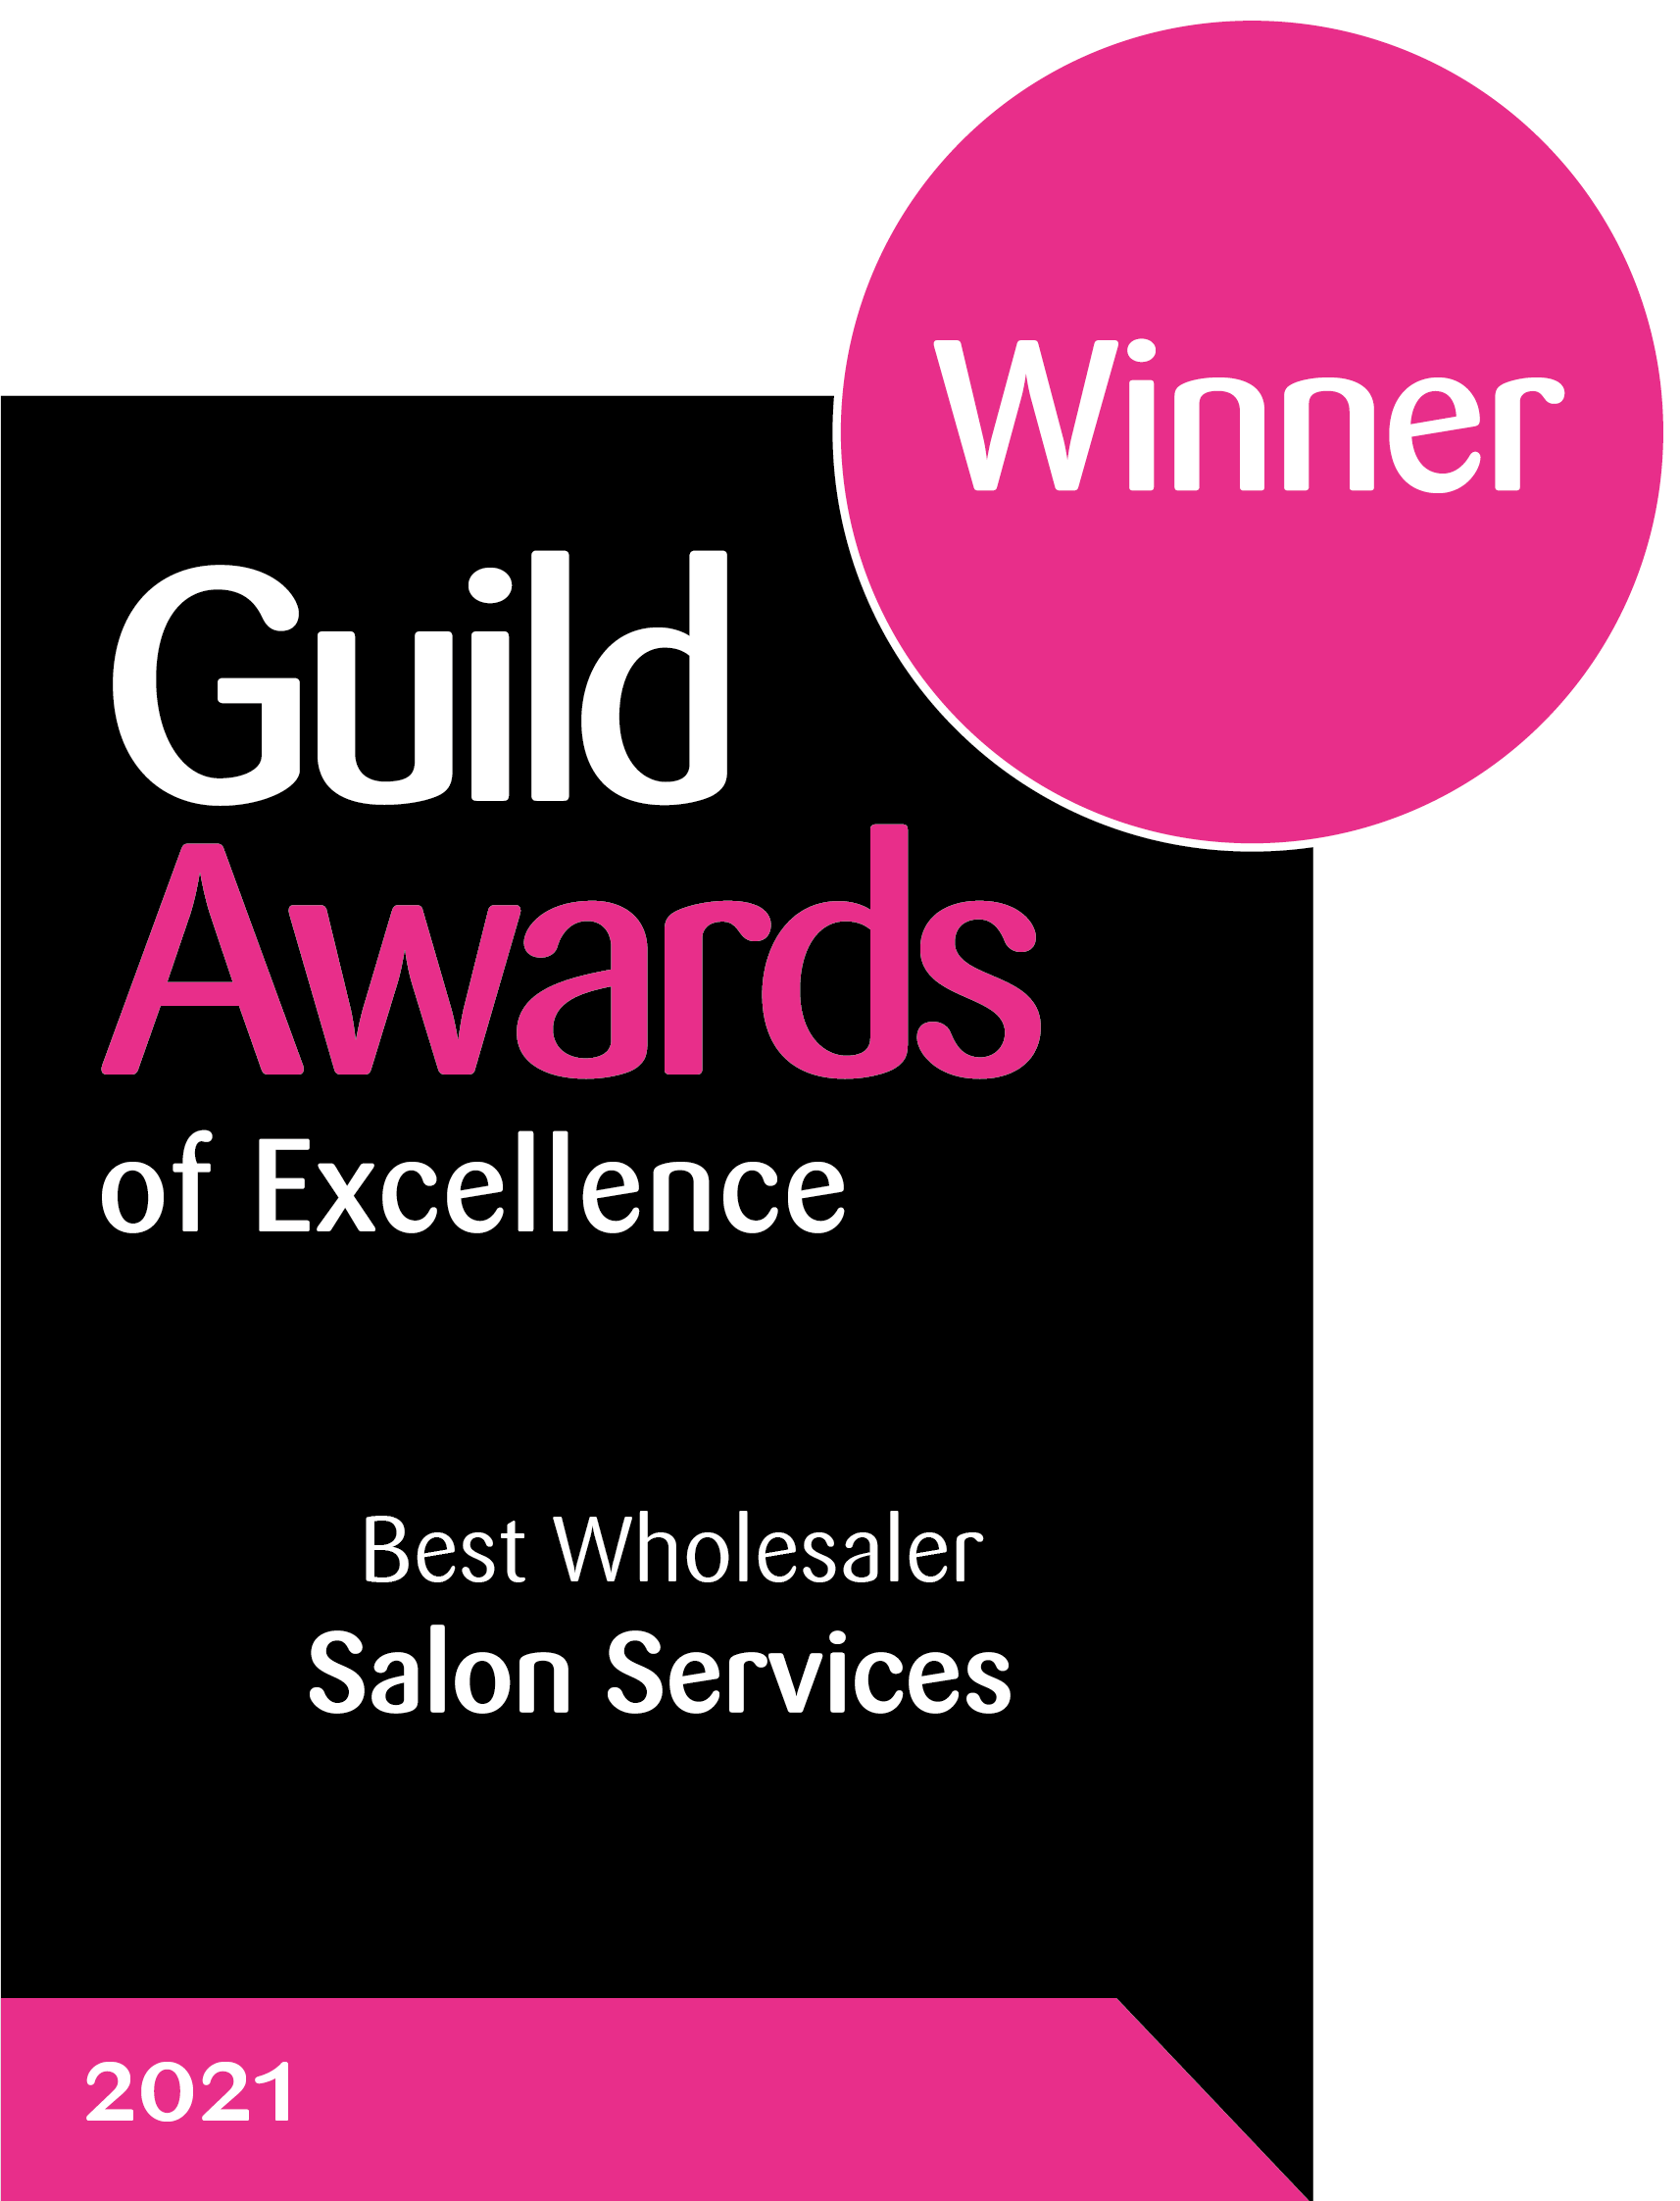 guild awards image 2